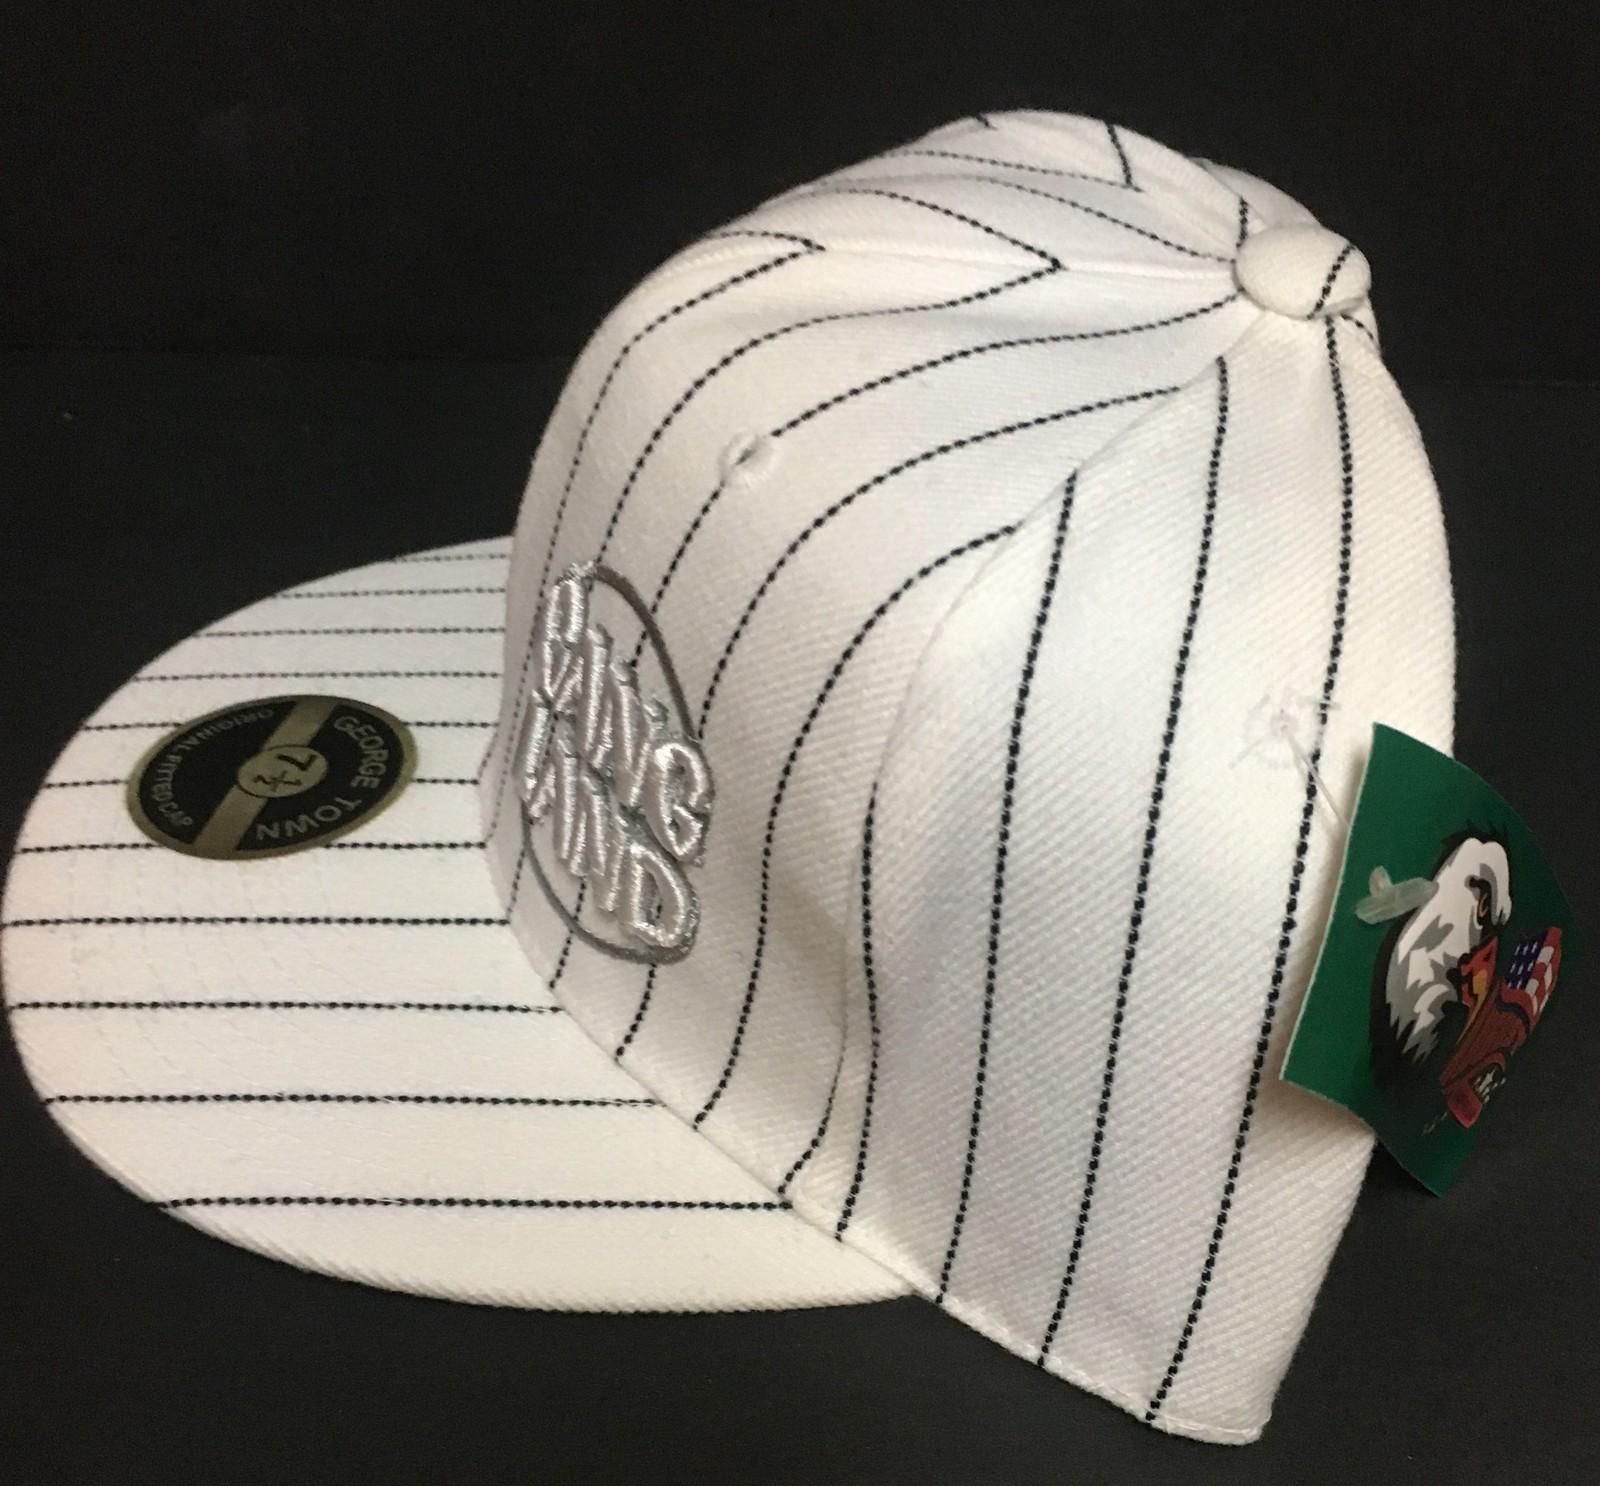 GANGLAND Authentic August Sportswear Hat Sz 7 1/2